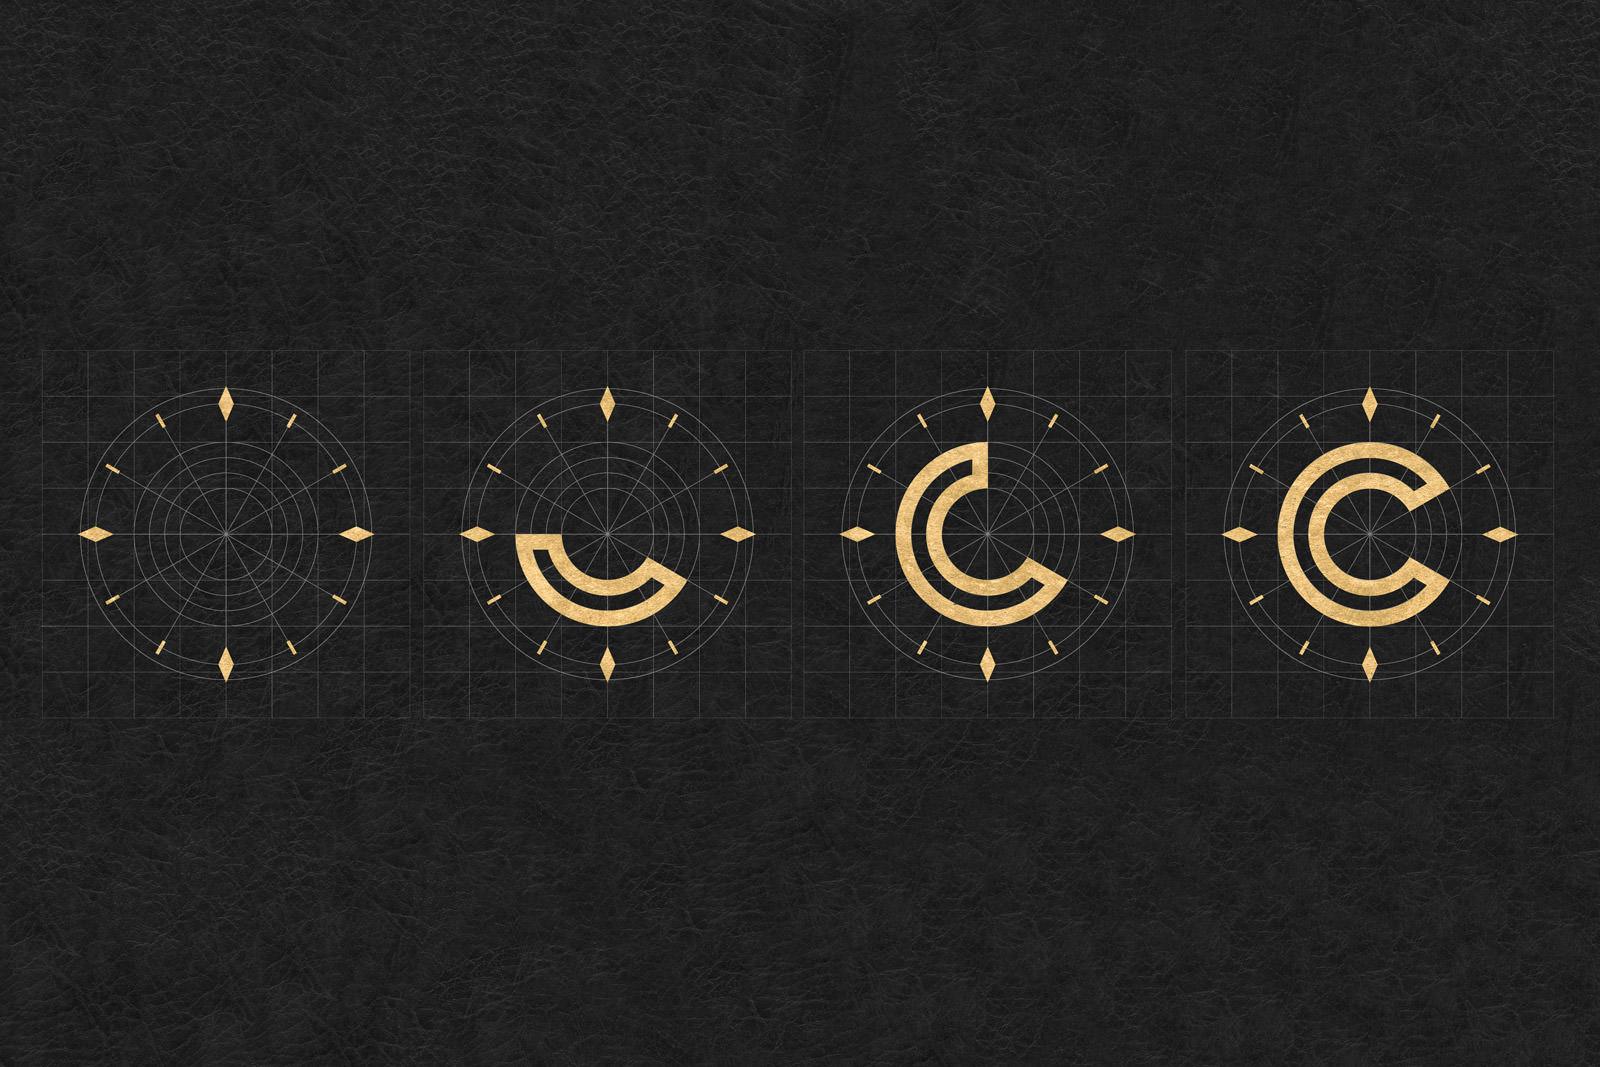 Figure-Jeremy-Hall-Design-Graphique-Logo-Branding-Image-De-Marque-Cendrillon-Restaurant-3.jpg